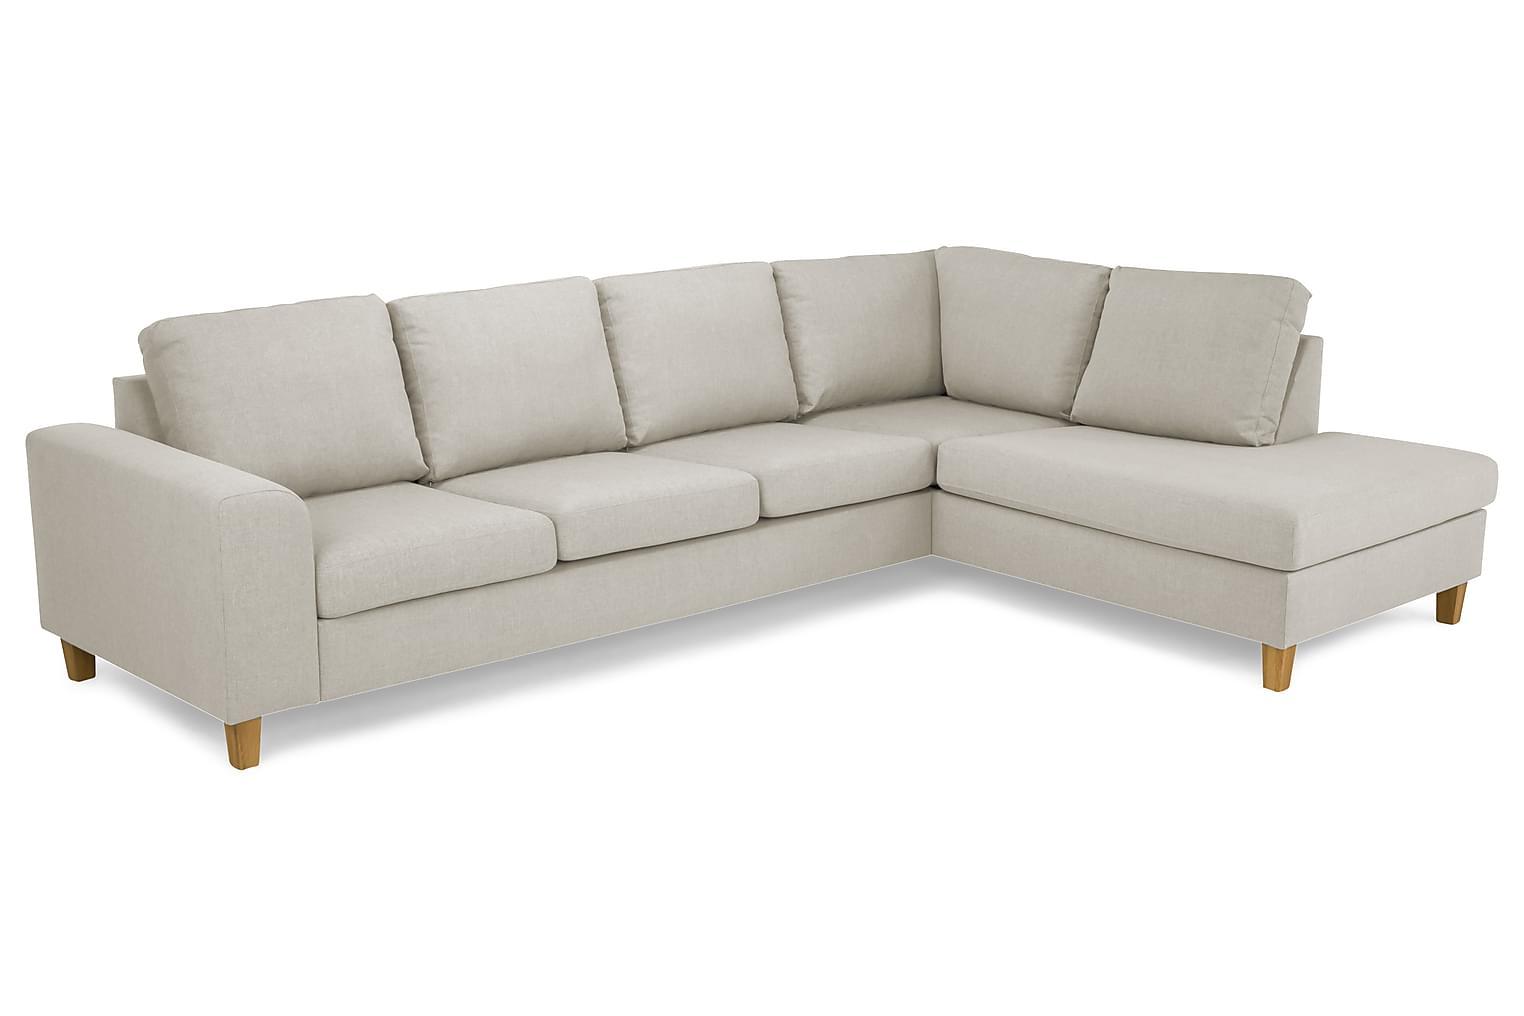 TURIN L-soffa 3-sits Höger Beige/Ekben -